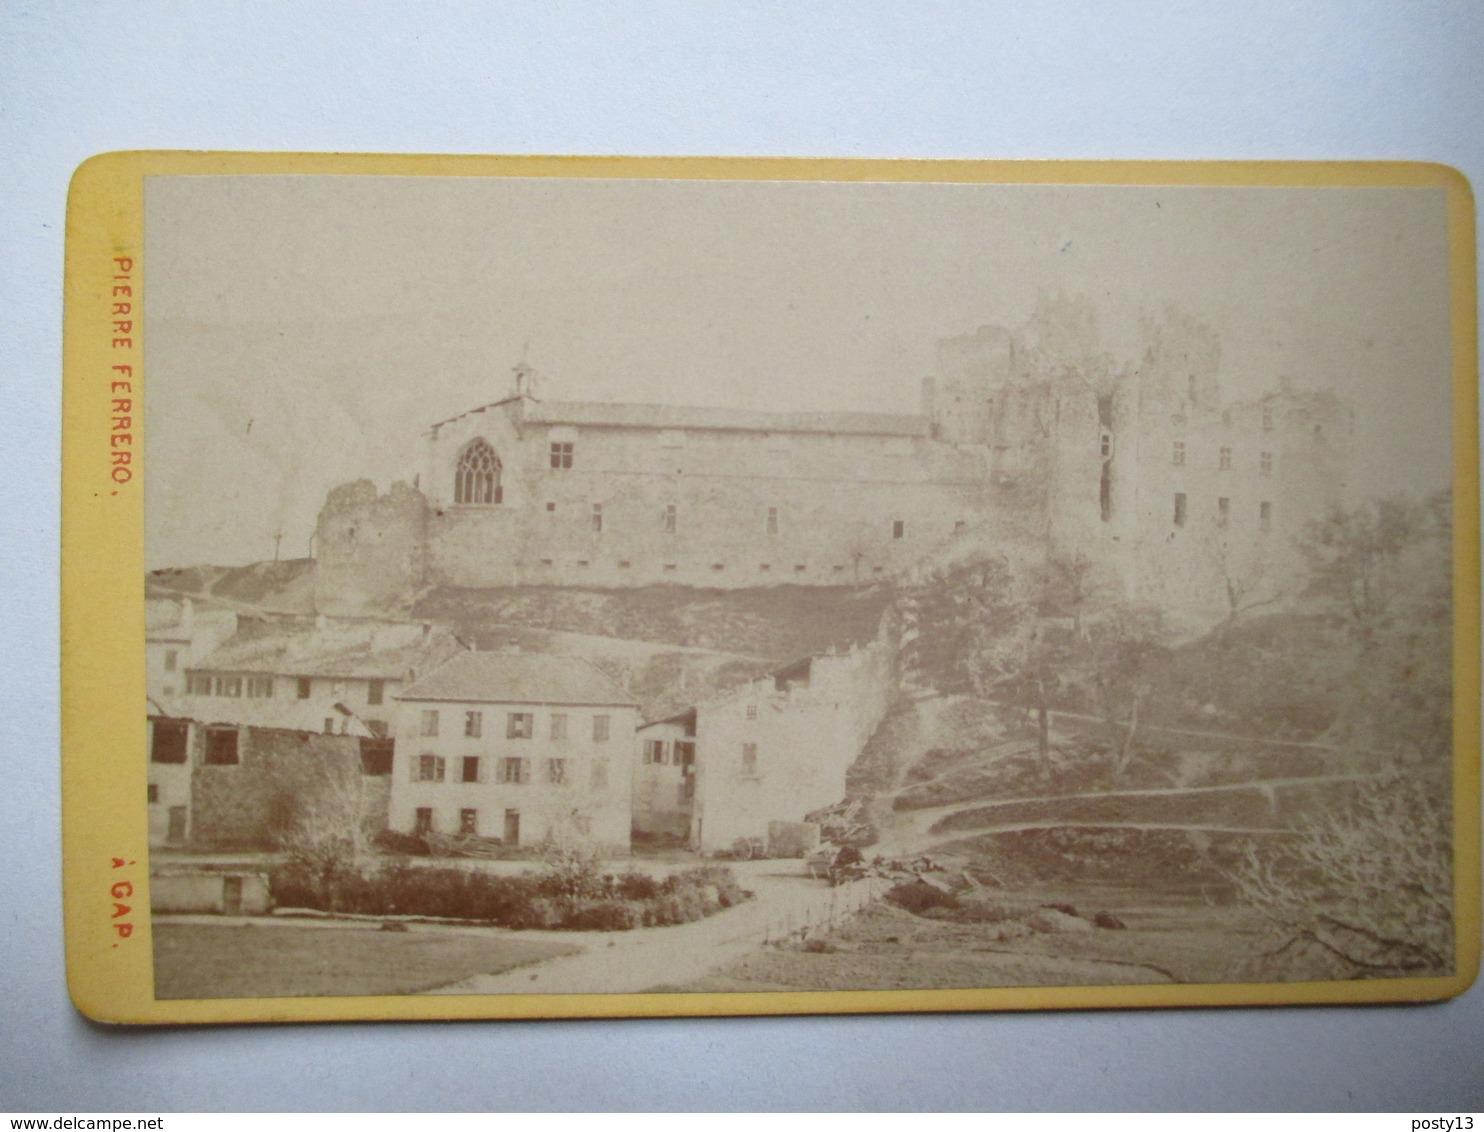 GAP (05) - Photographie Ancienne CDV Albumine - Ruines Du Château De Tallard   - Photo Pierre Ferrero ,Gap -  TBE - Photos